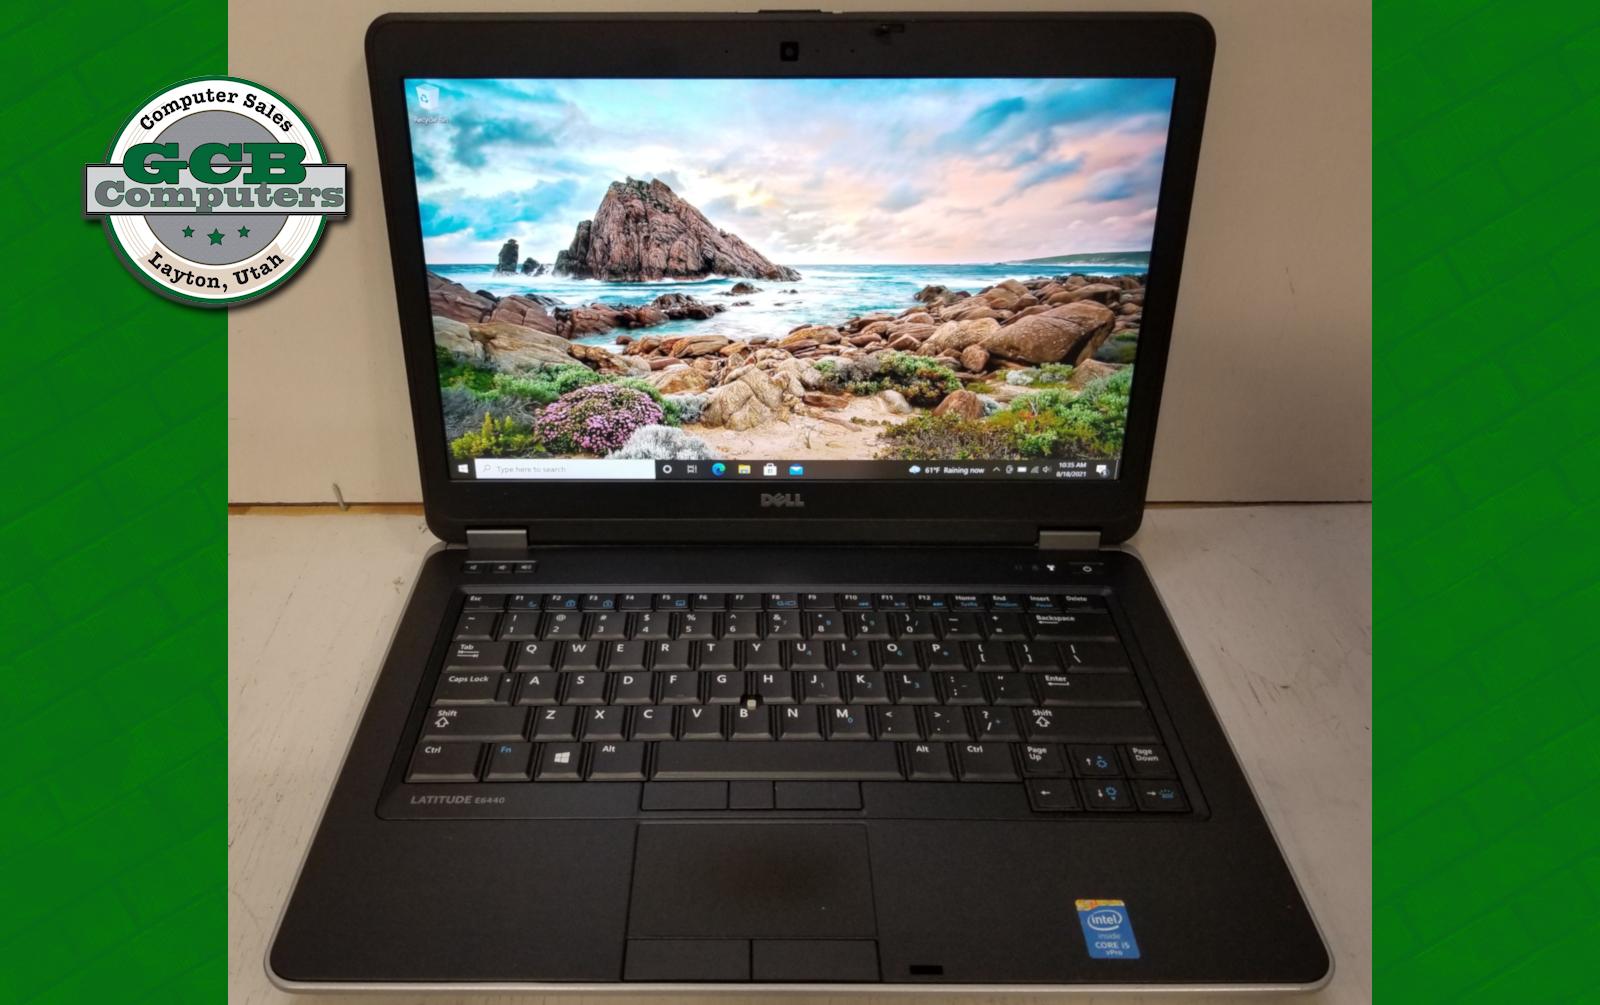 $200 Dell 6440 i5-4310M 256GB SSD 8GB RAM 1080p Screen